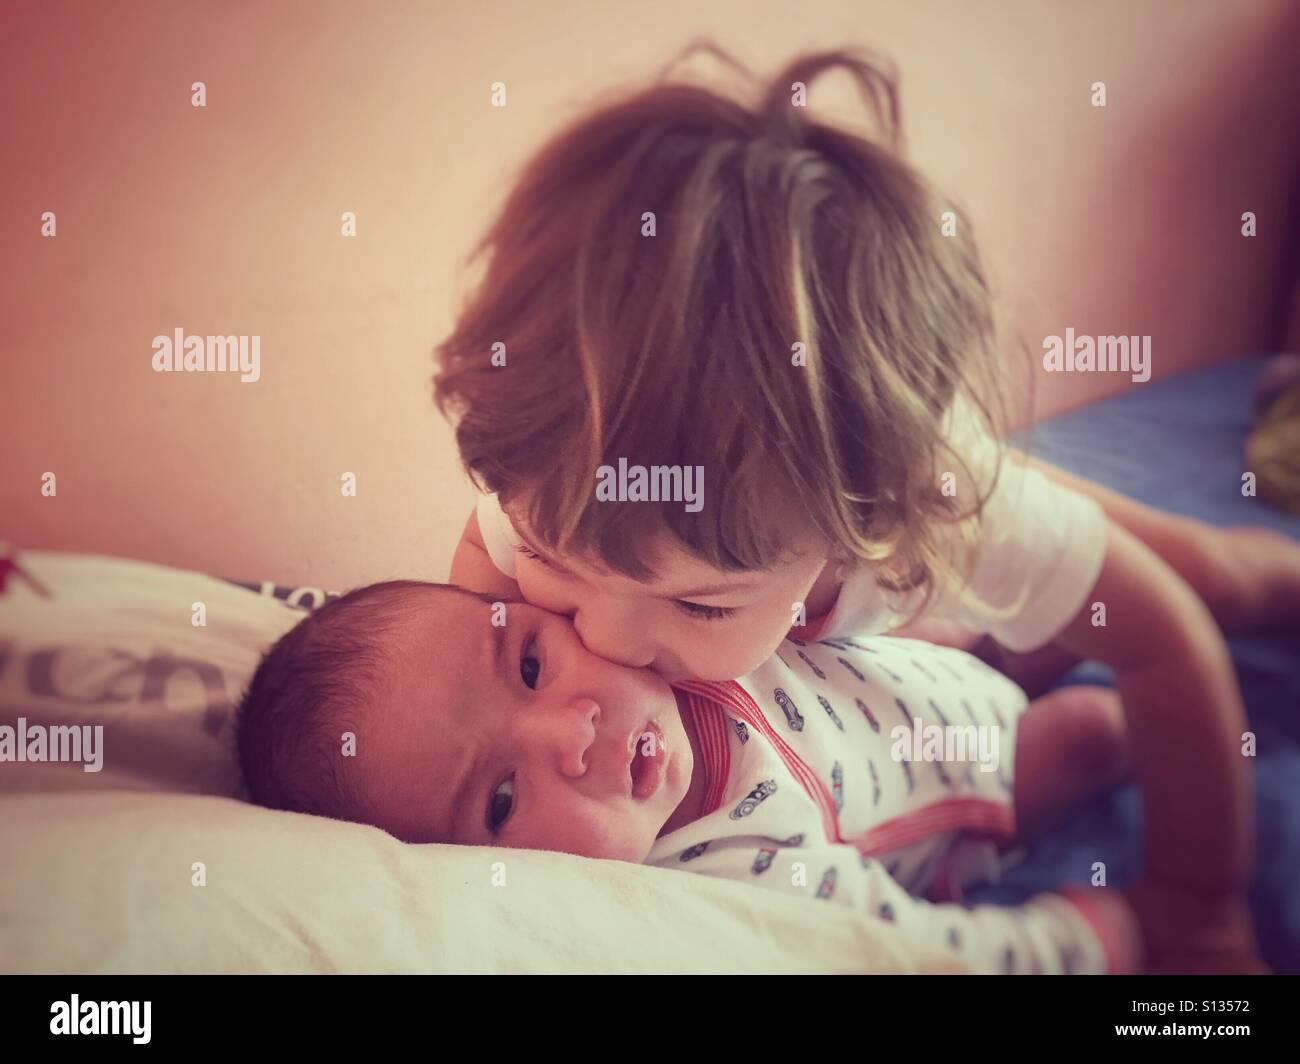 Besando a su hermana hermano Imagen De Stock